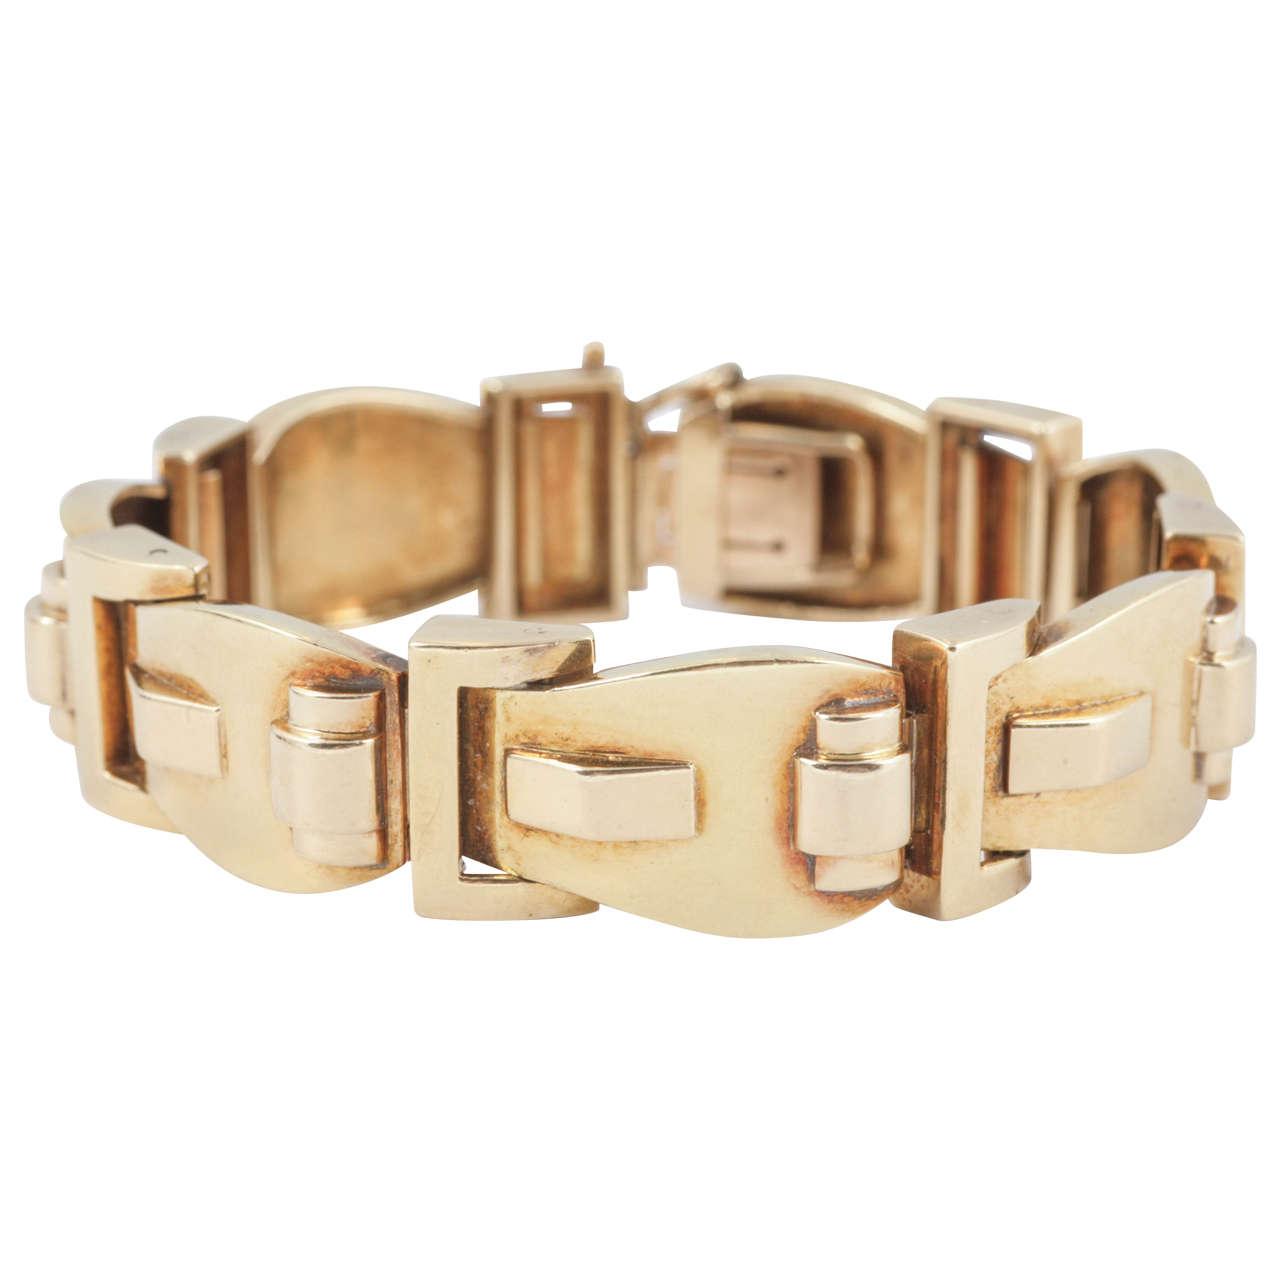 1940s Buckle Style Bracelet